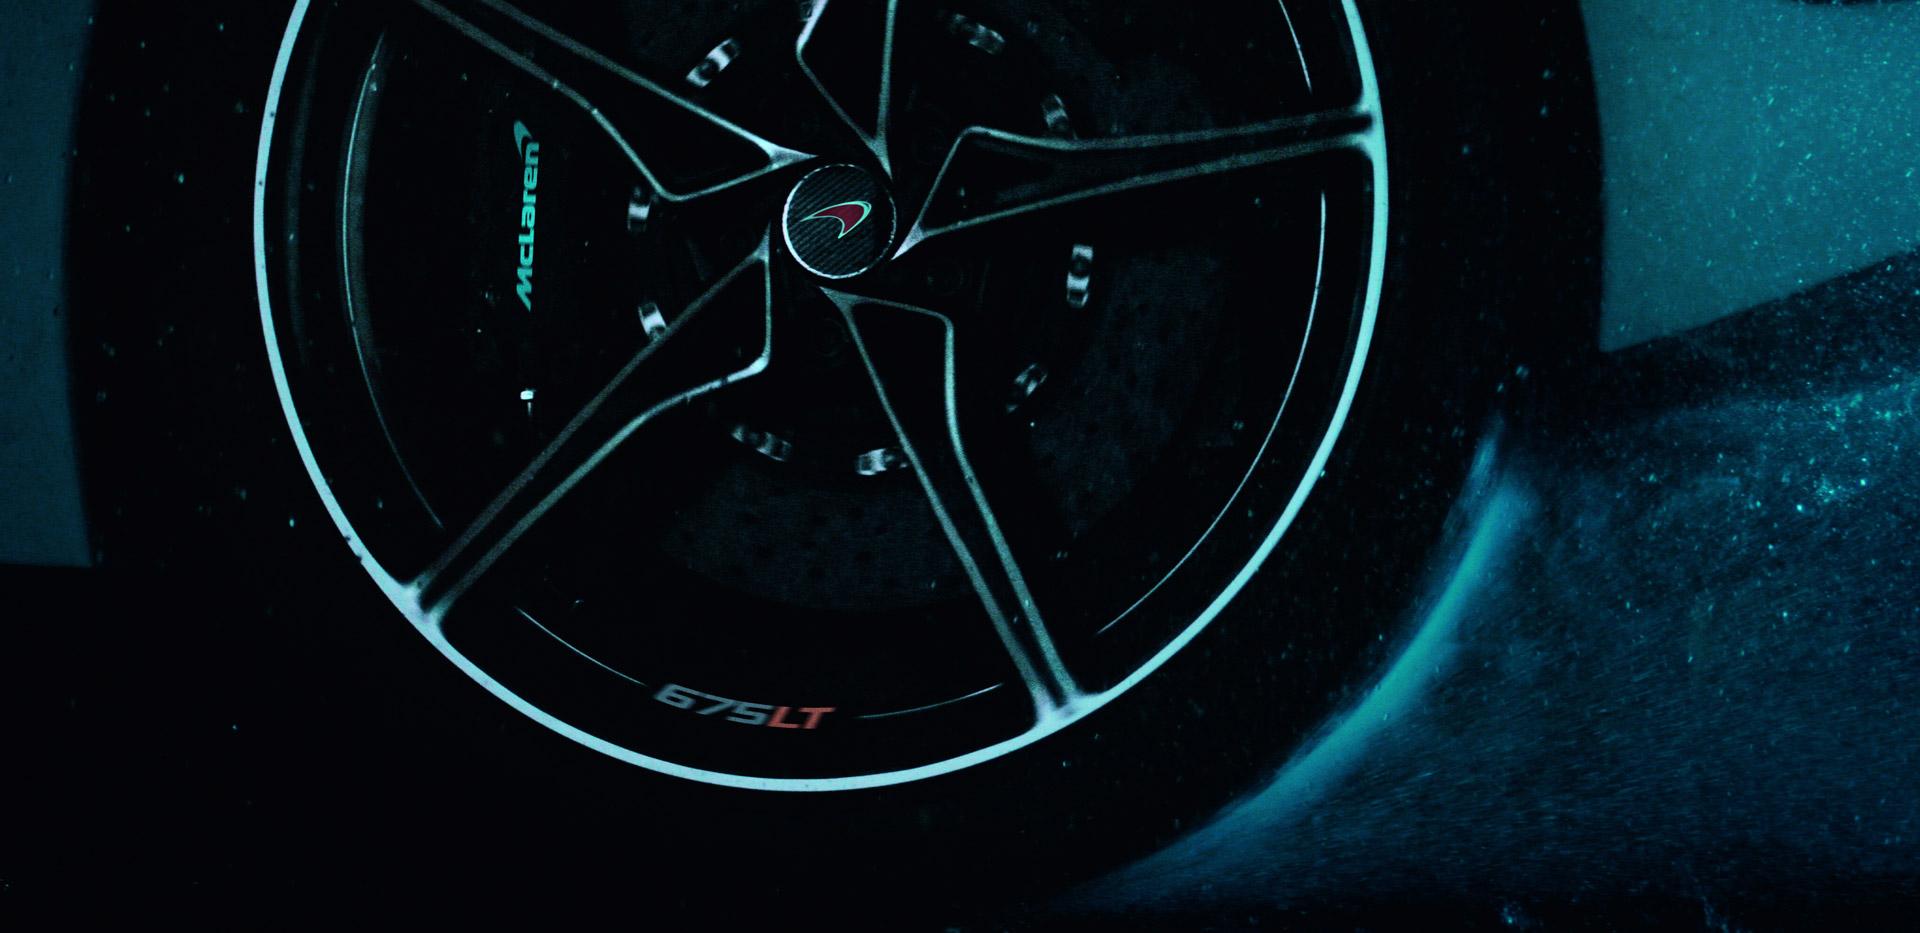 McLaren Confirms New 675LT, Announces Super Series Family Of Cars